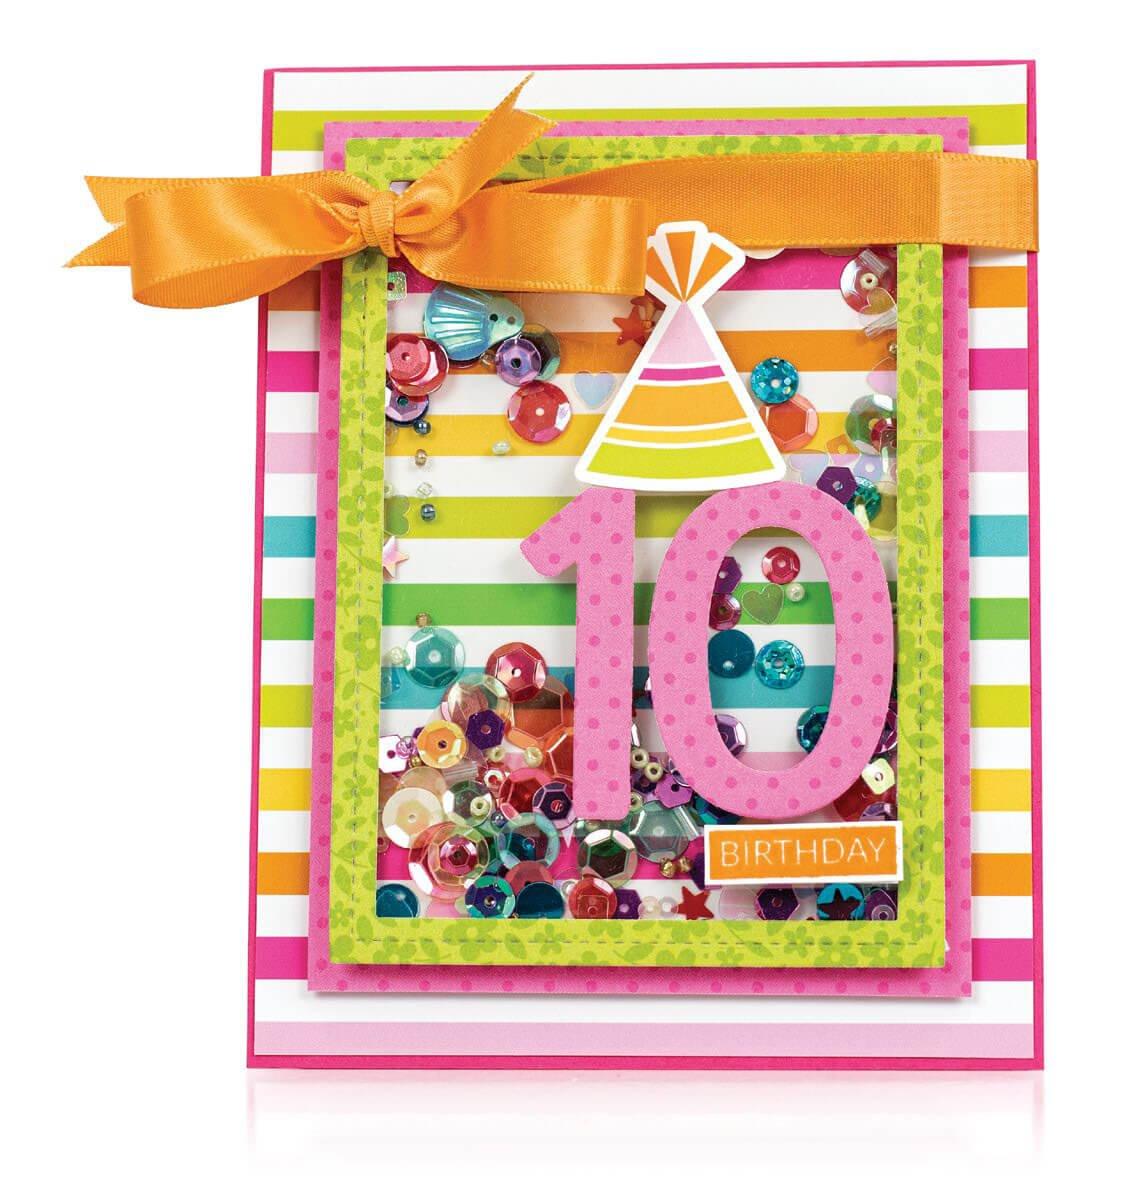 Scrapbook & Cards Today - Spring 2020 - 10th Birthday card by Latisha Yoast